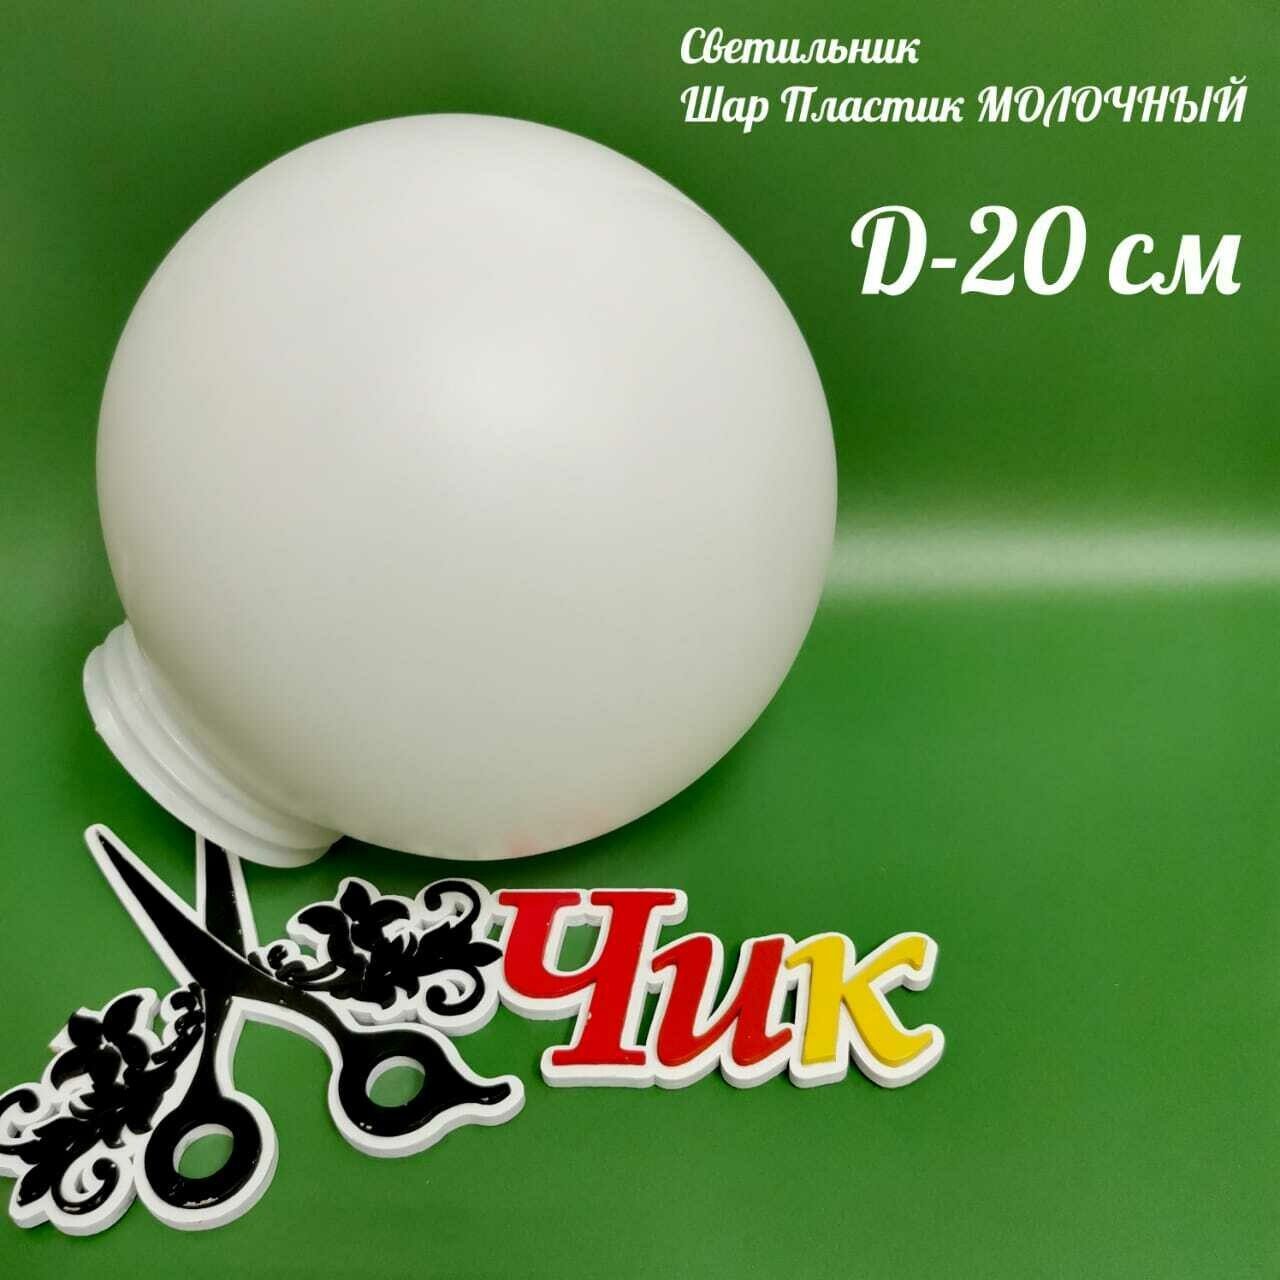 Рассеиватель ШАР-ПЛАСТИК (МОЛОЧНЫЙ) диаметр 20 см.